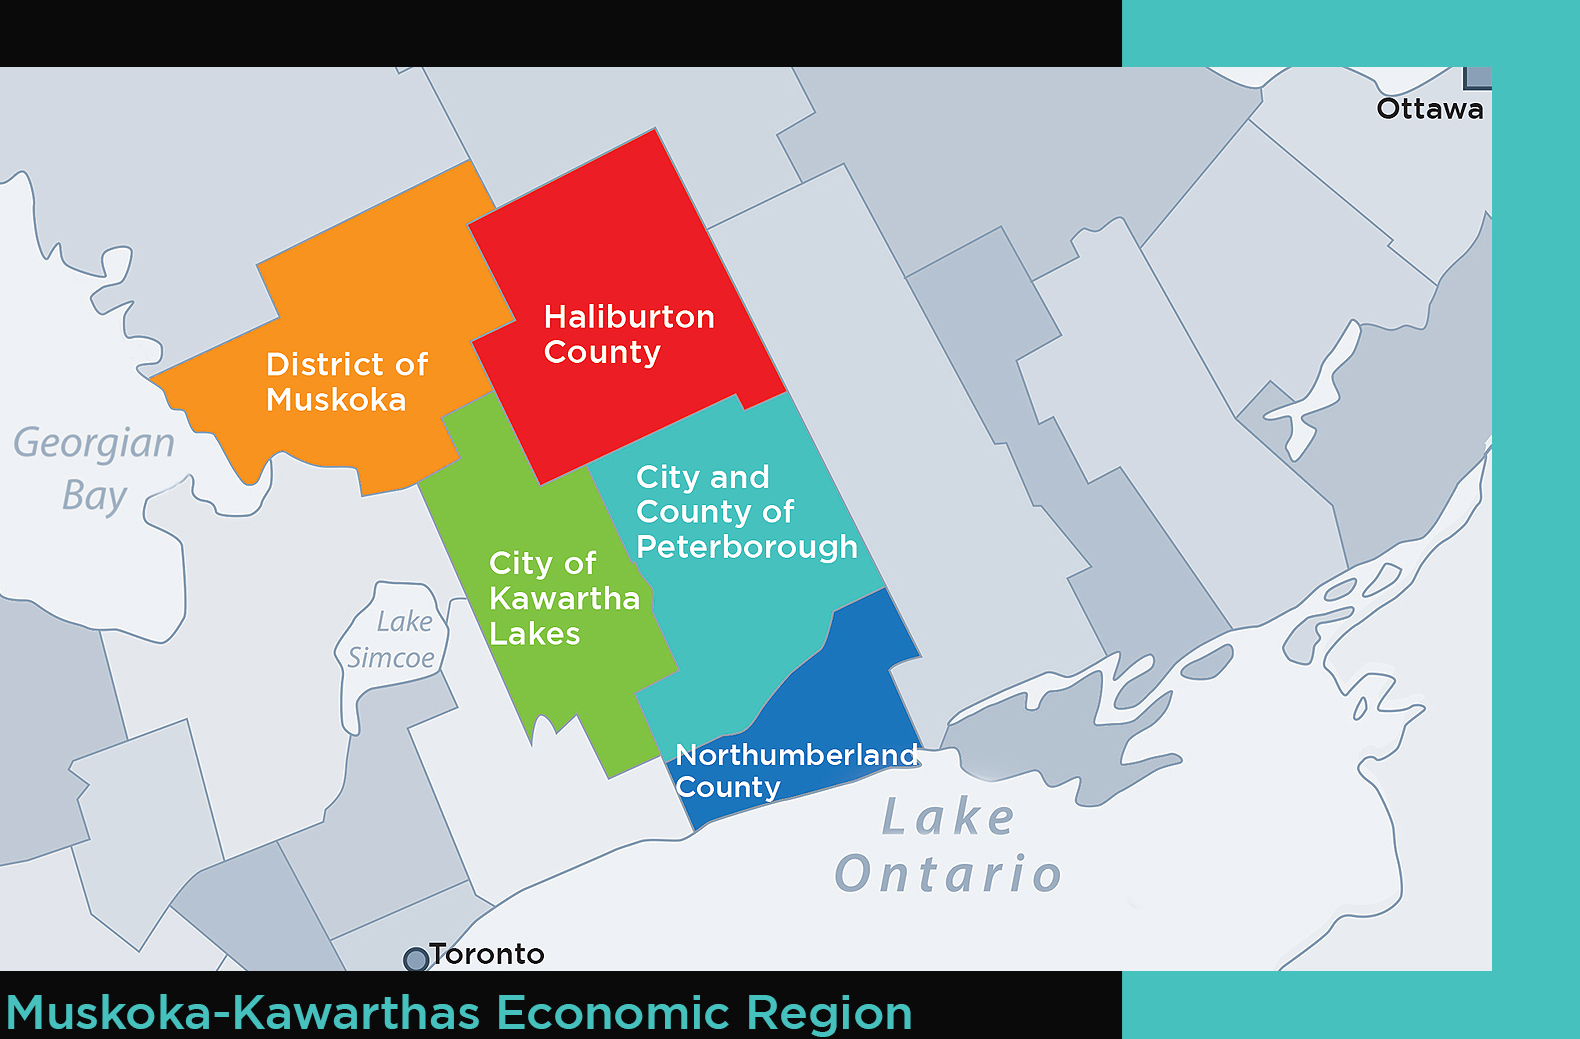 Map of Ontario that highlights the areas of Muskoka, Haliburton, Kawartha Lakes, Peterborough and Northumberland.